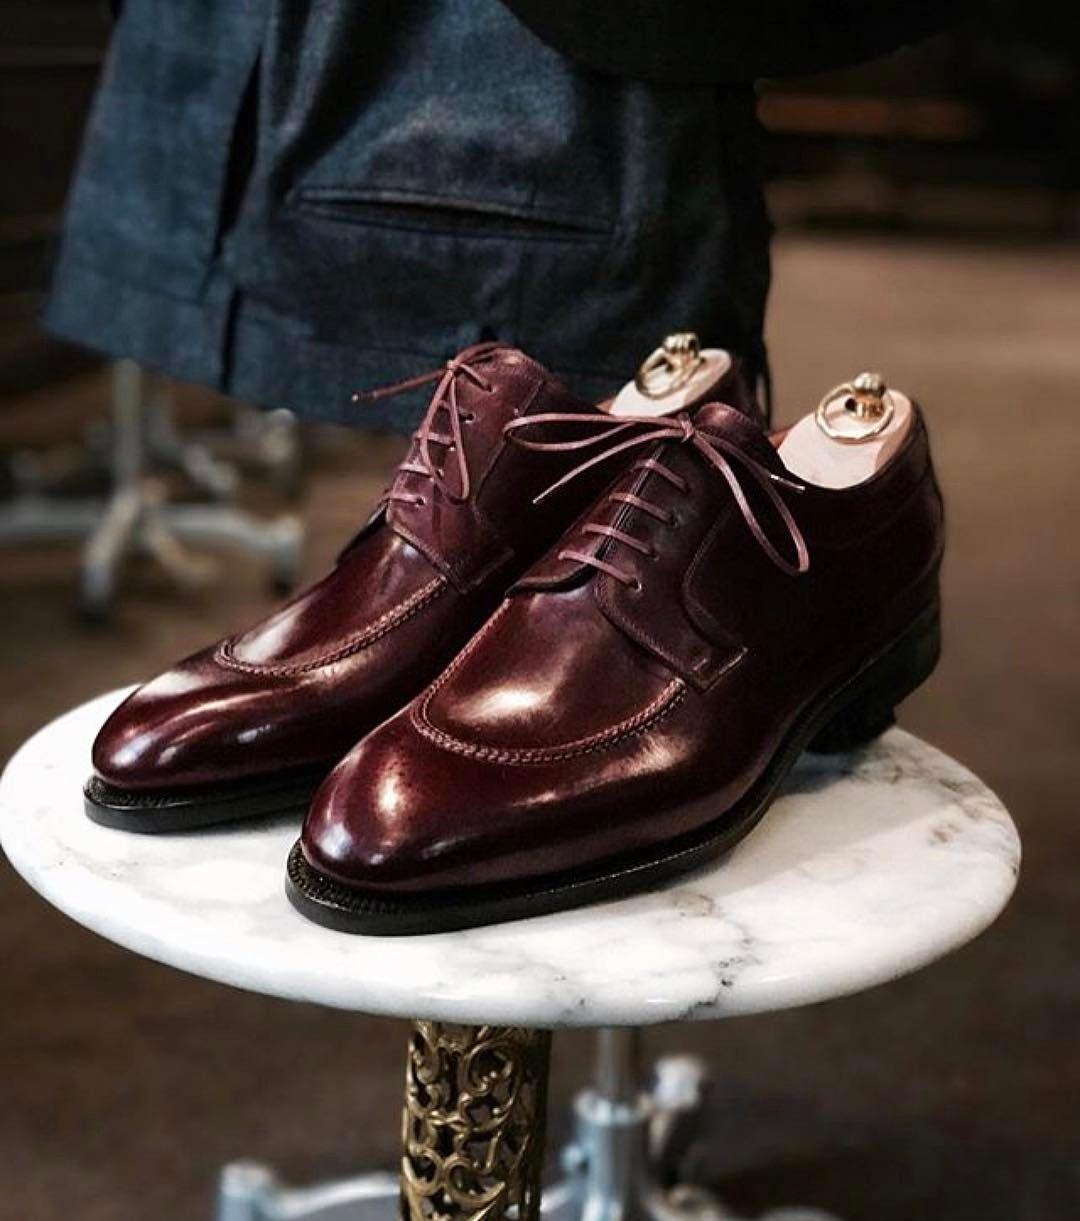 818 Likes 9 Comments Stefano Bemer Stefanobemer On Instagram Stefanobemermto Thecloakroom Firenze S Finest Dress Shoes Men Shoes Mens Men S Shoes